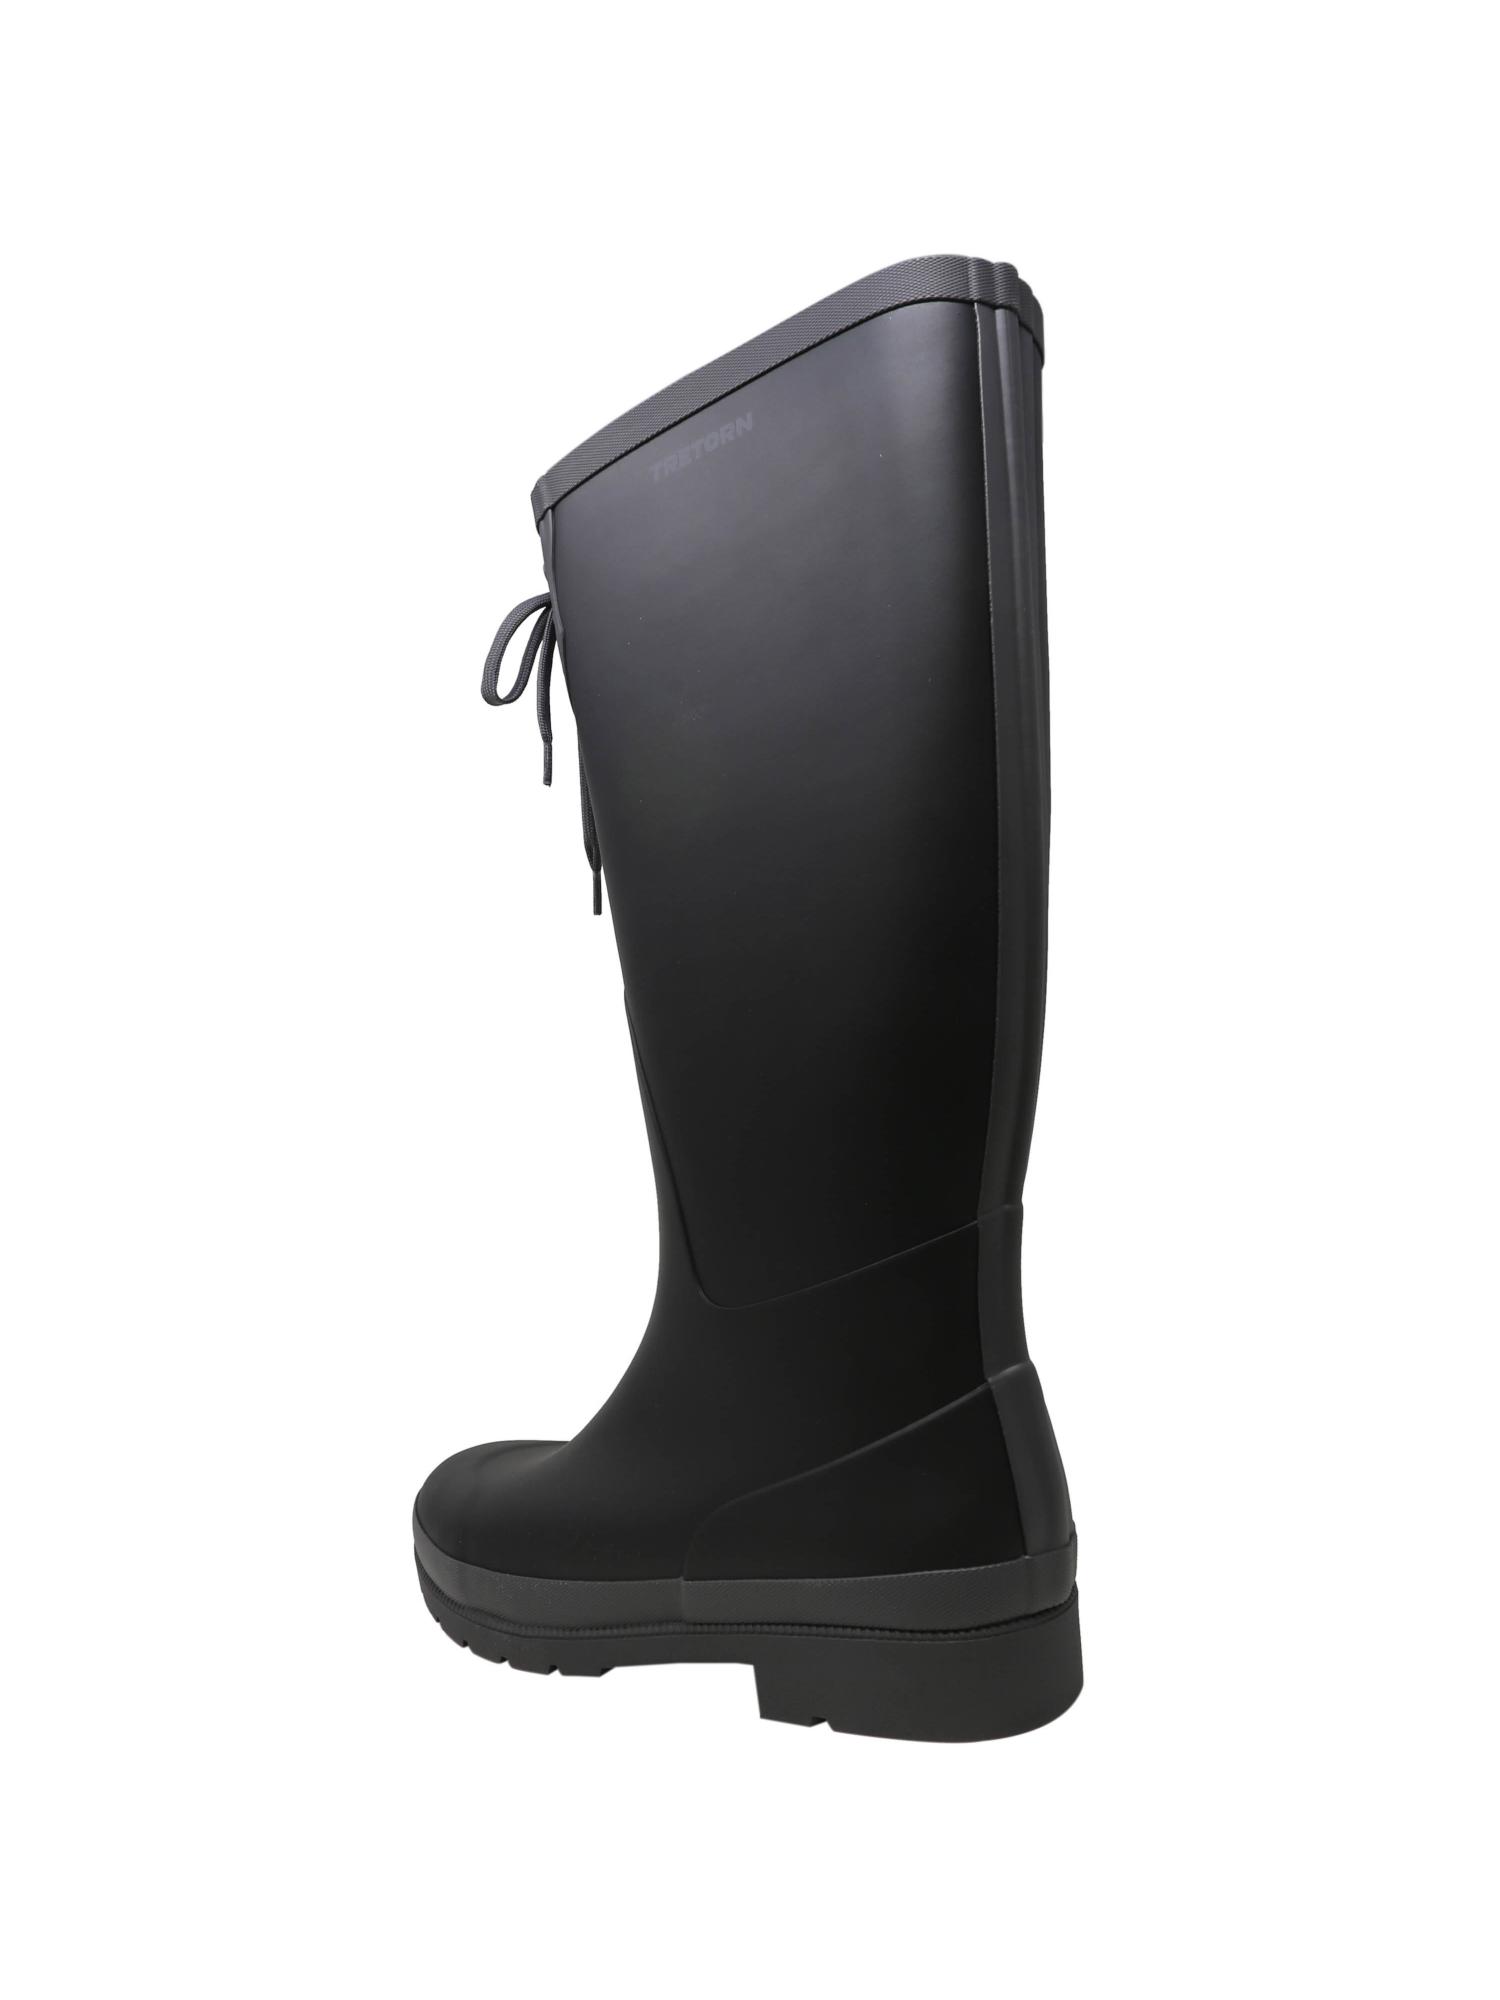 Tretorn-Women-039-s-Lacey-Rubber-Knee-High-Rain-Boot thumbnail 6